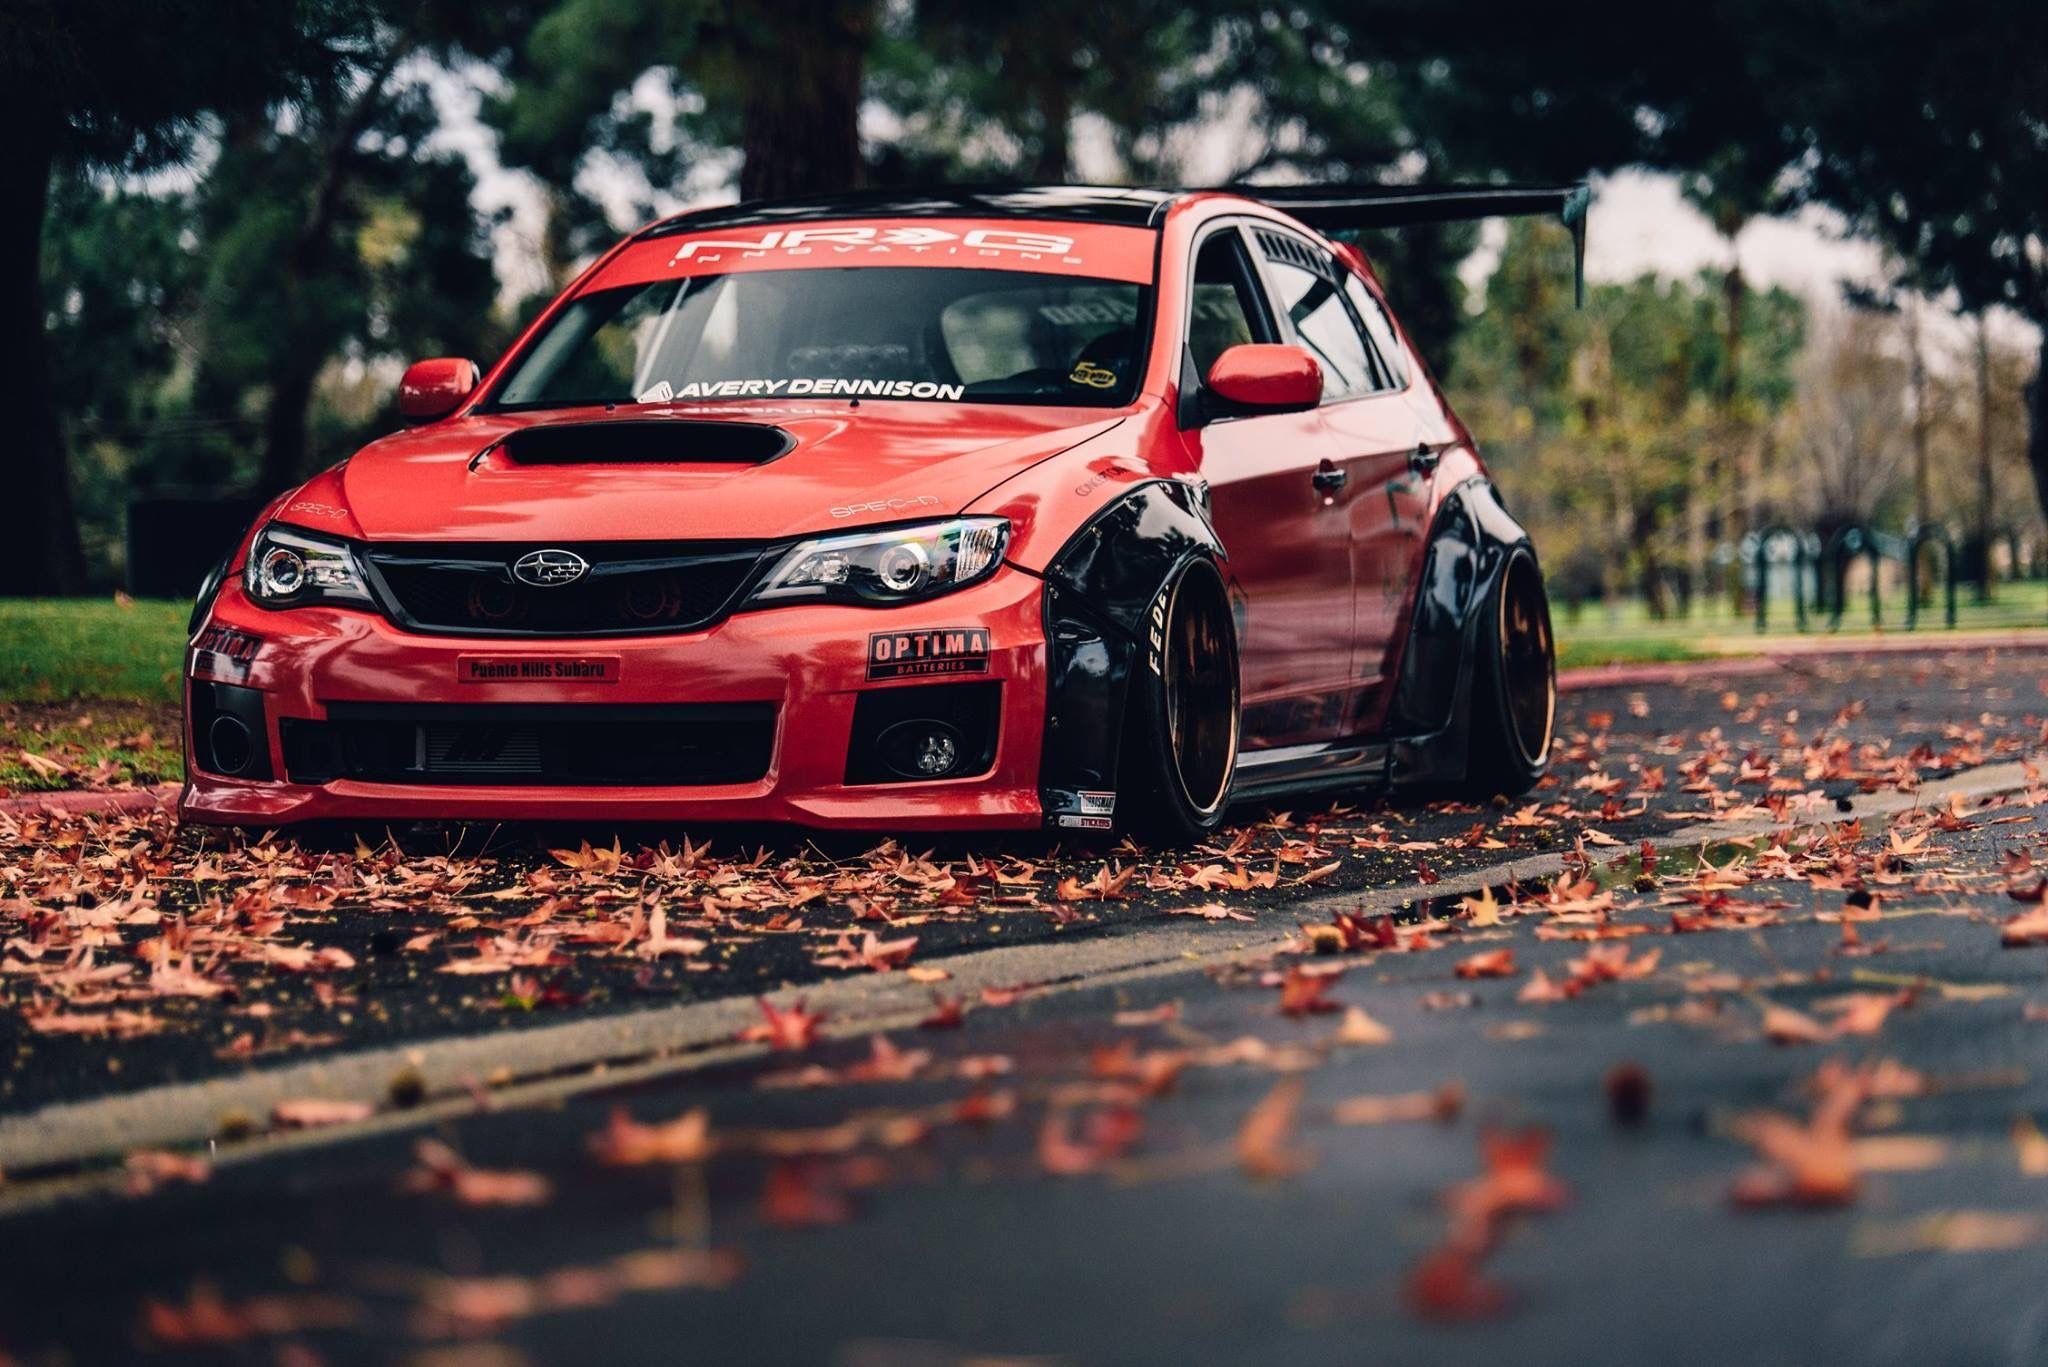 Pin By Jathniel Dyce On Cars Pinterest Subaru Cars And Subaru Wrx